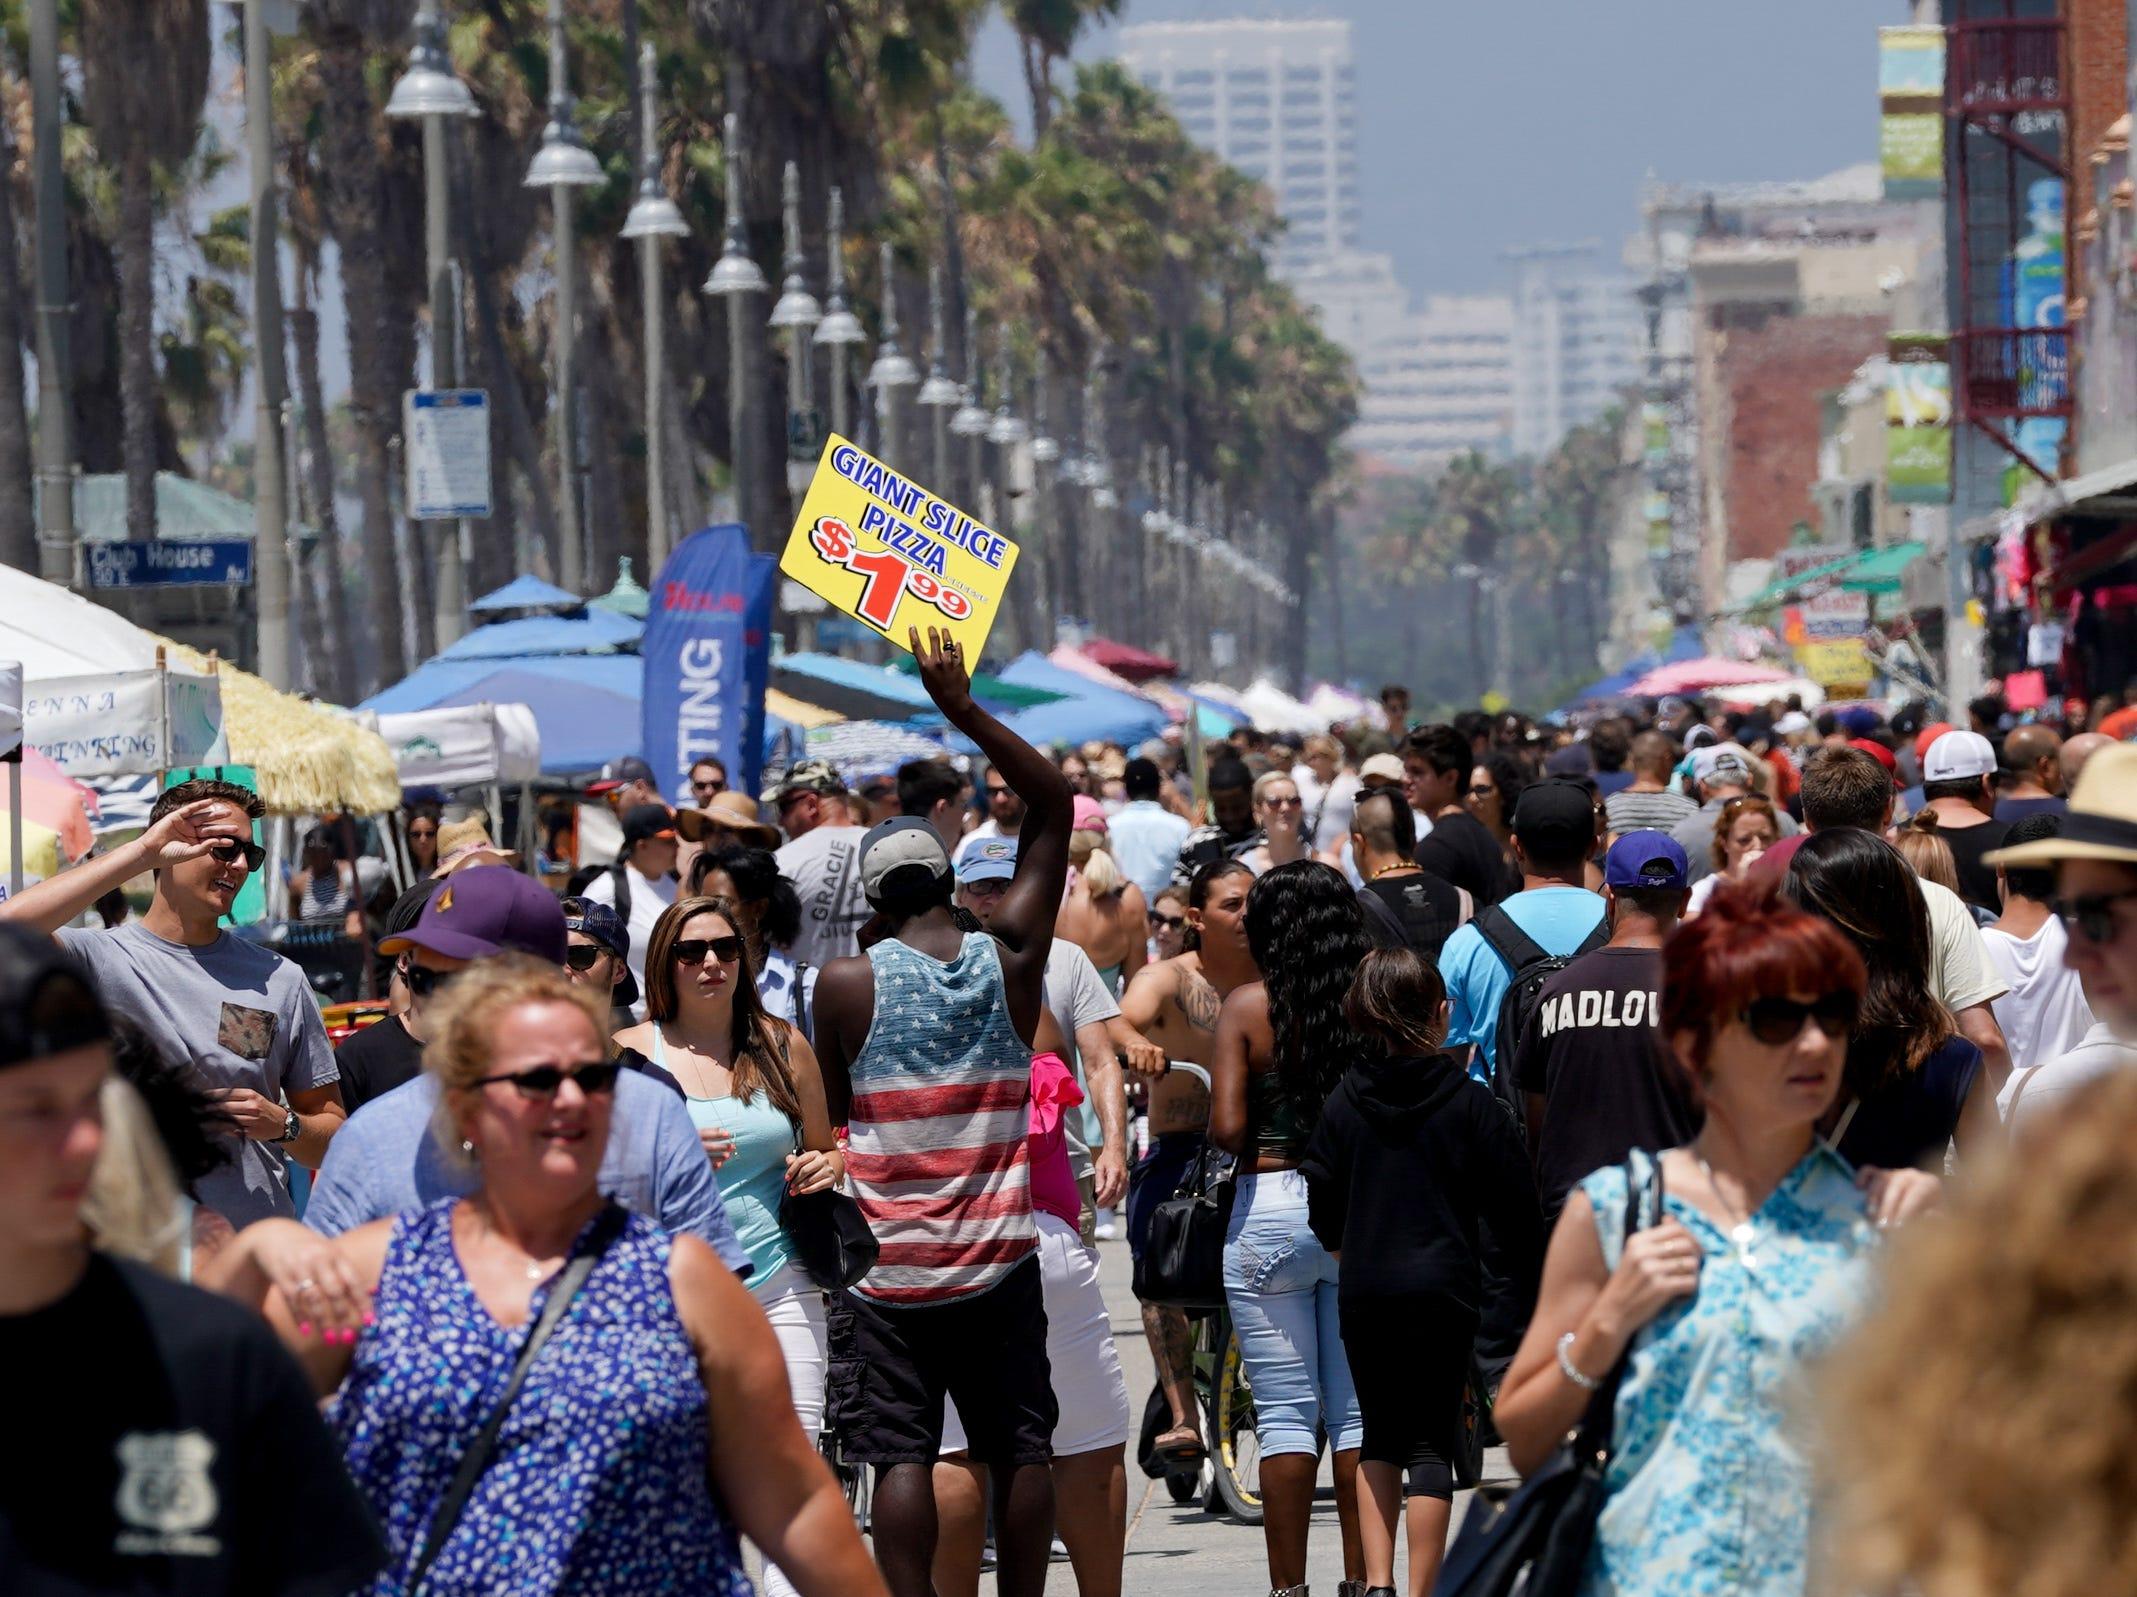 A crowded Saturday in Venice Beach